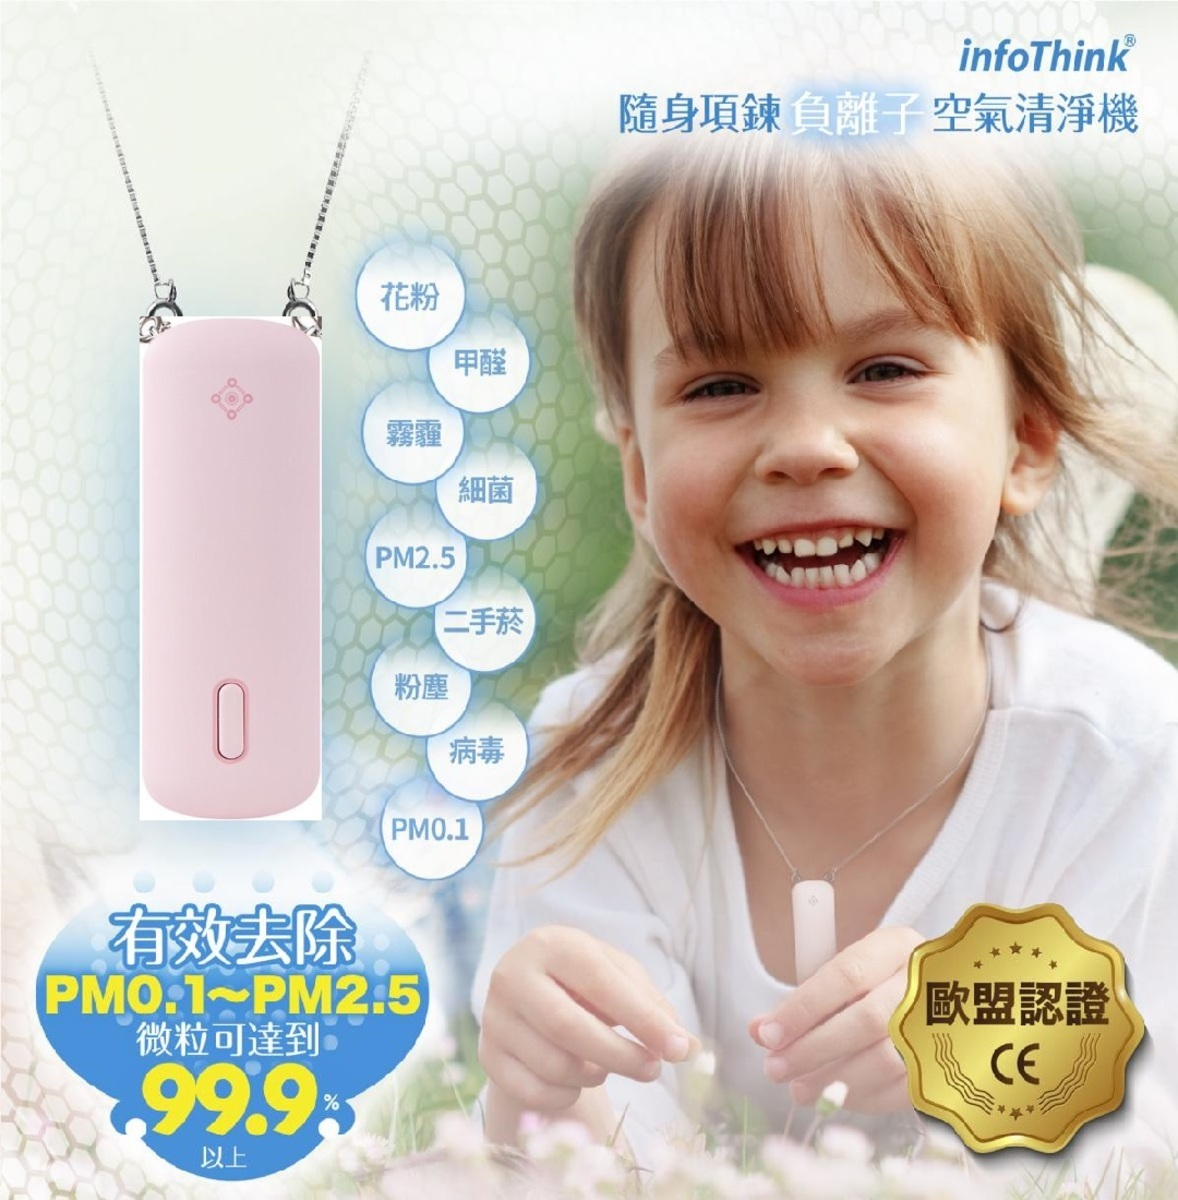 iAnion-100 Wearable Air Purifier - Pink